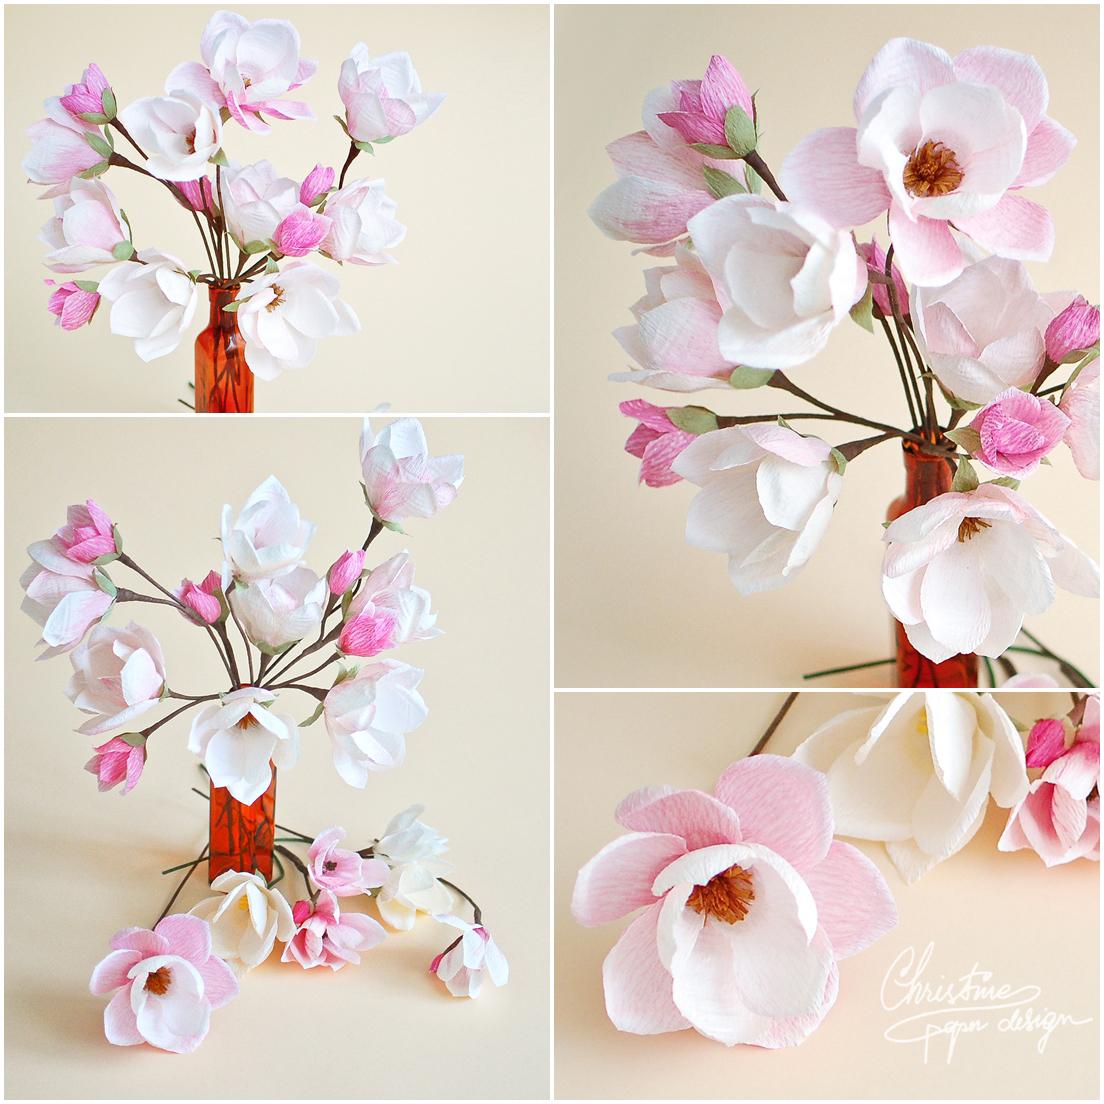 Christine paper design - paper diy magnolia 2.jpg